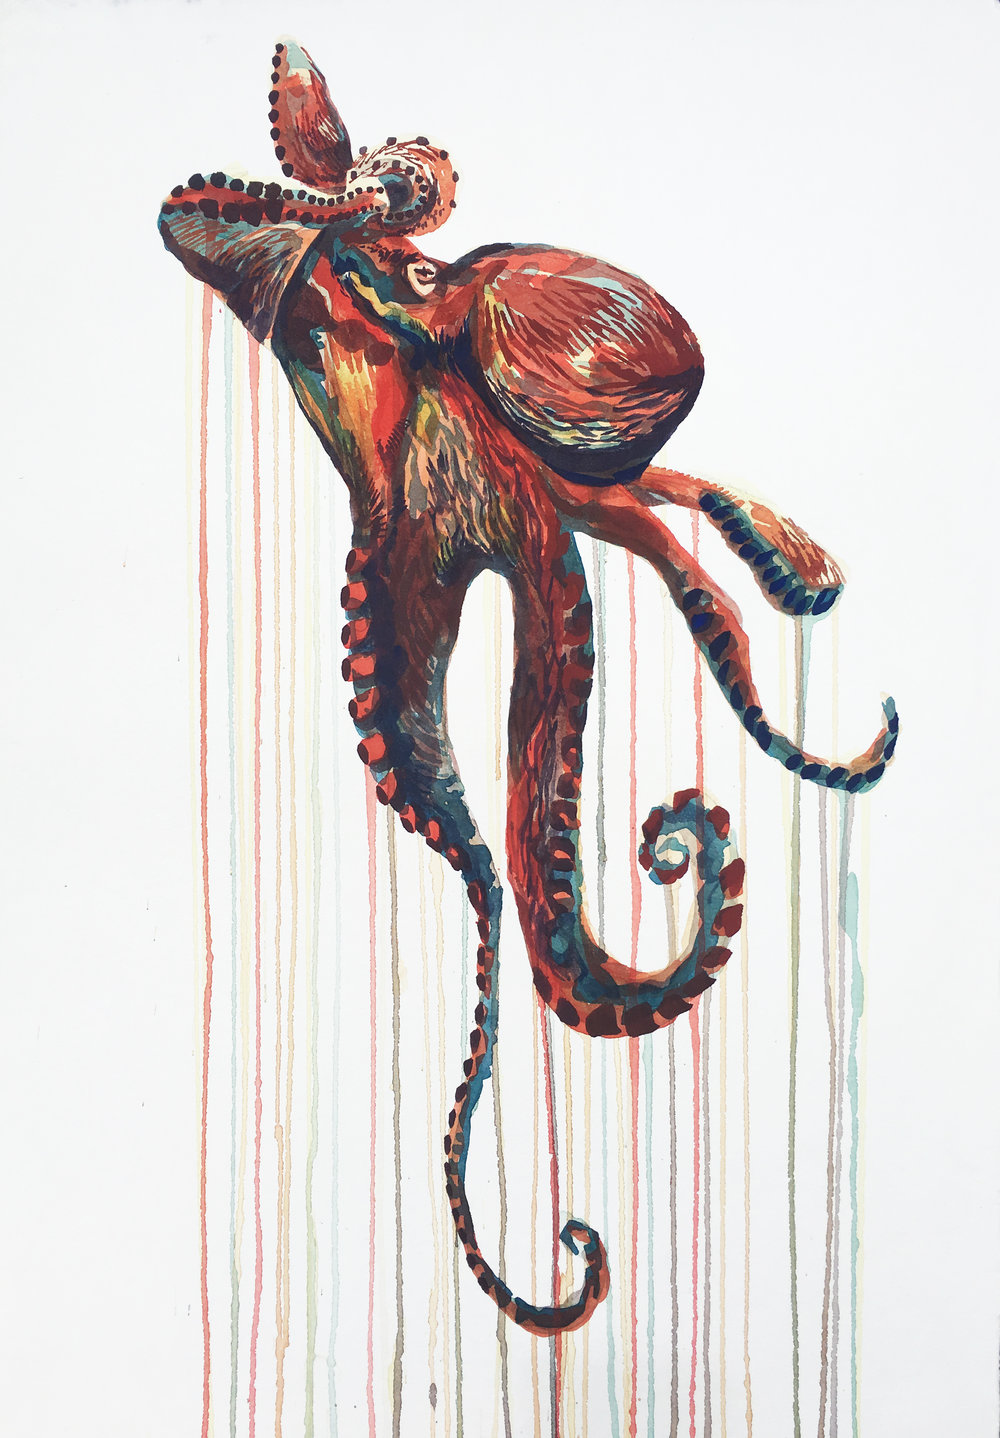 Kai_Kaulukukui_Red_Octopus.jpg